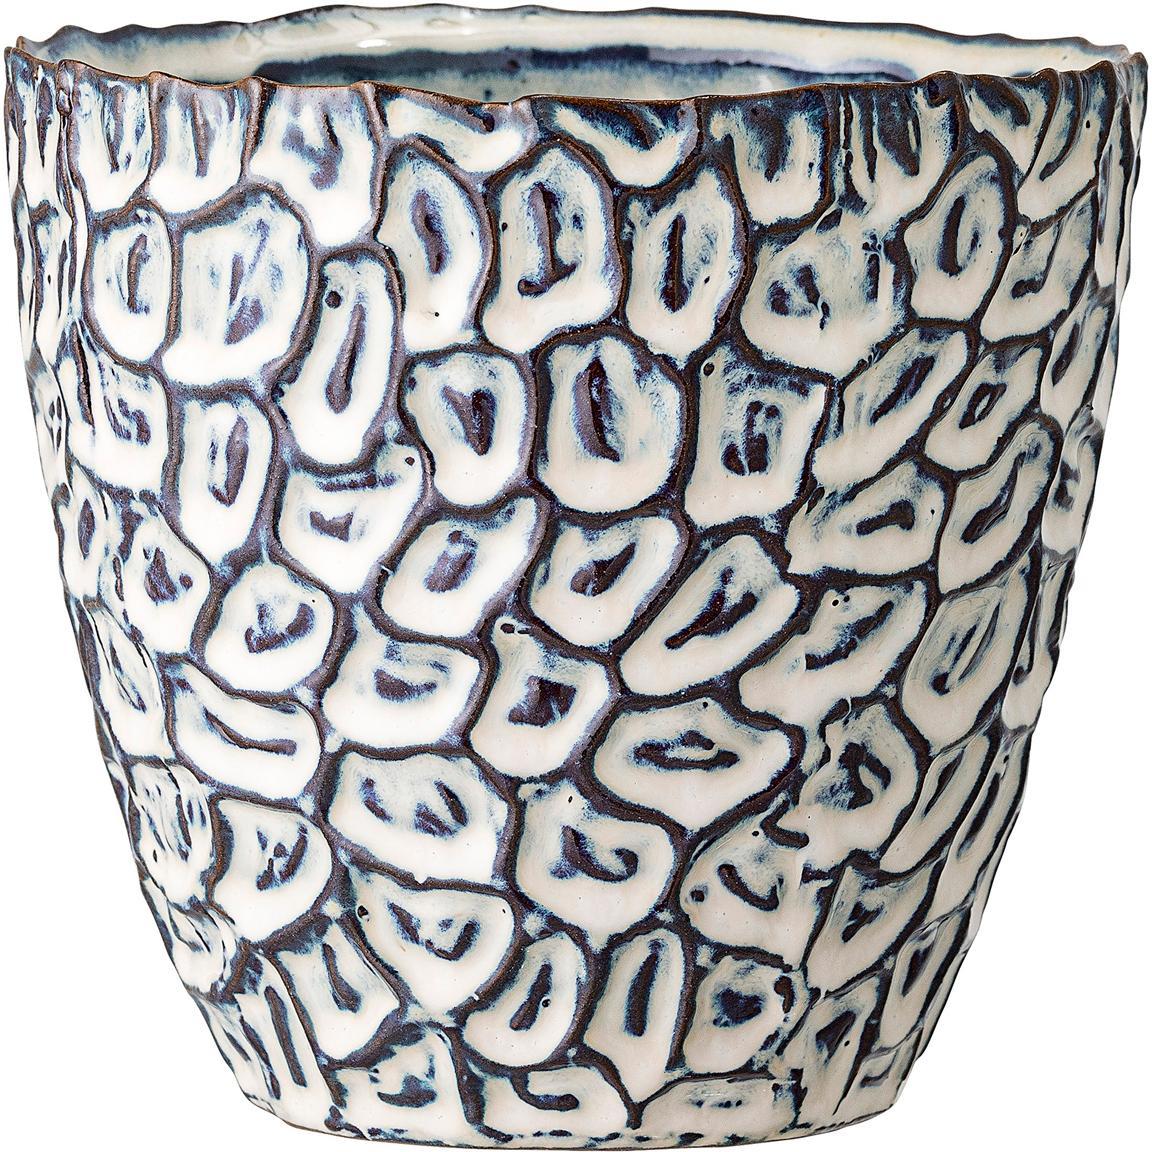 Portavaso fatto a mano in terracotta Bonia, Terracotta, Bianco, blu, Ø 14 x Alt. 14 cm